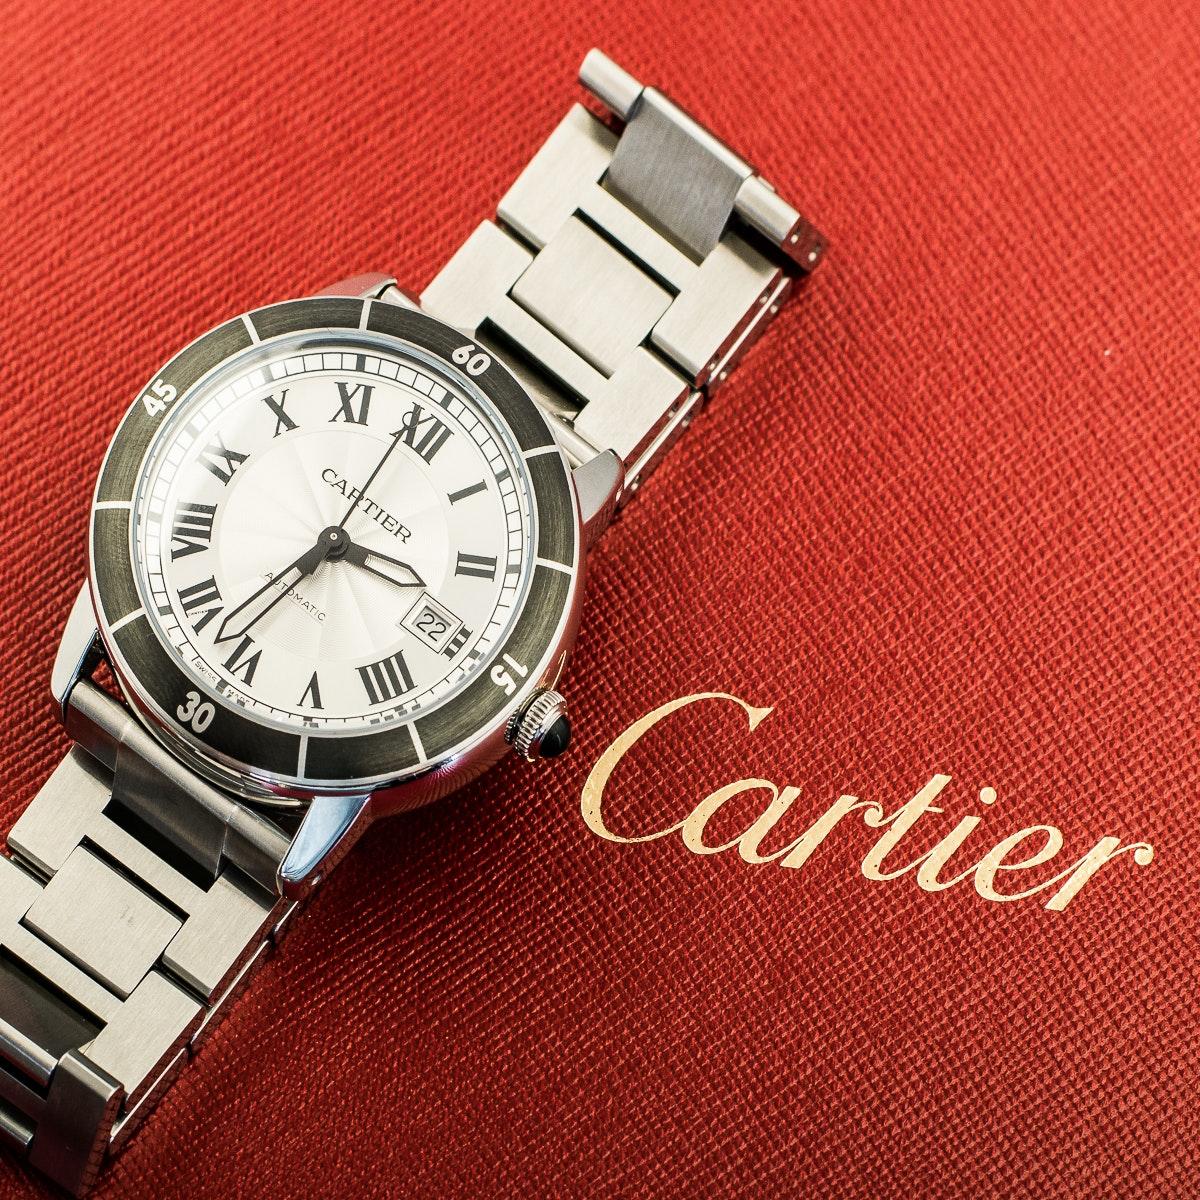 Cartier Ronde Croisiere Men's Wristwatch